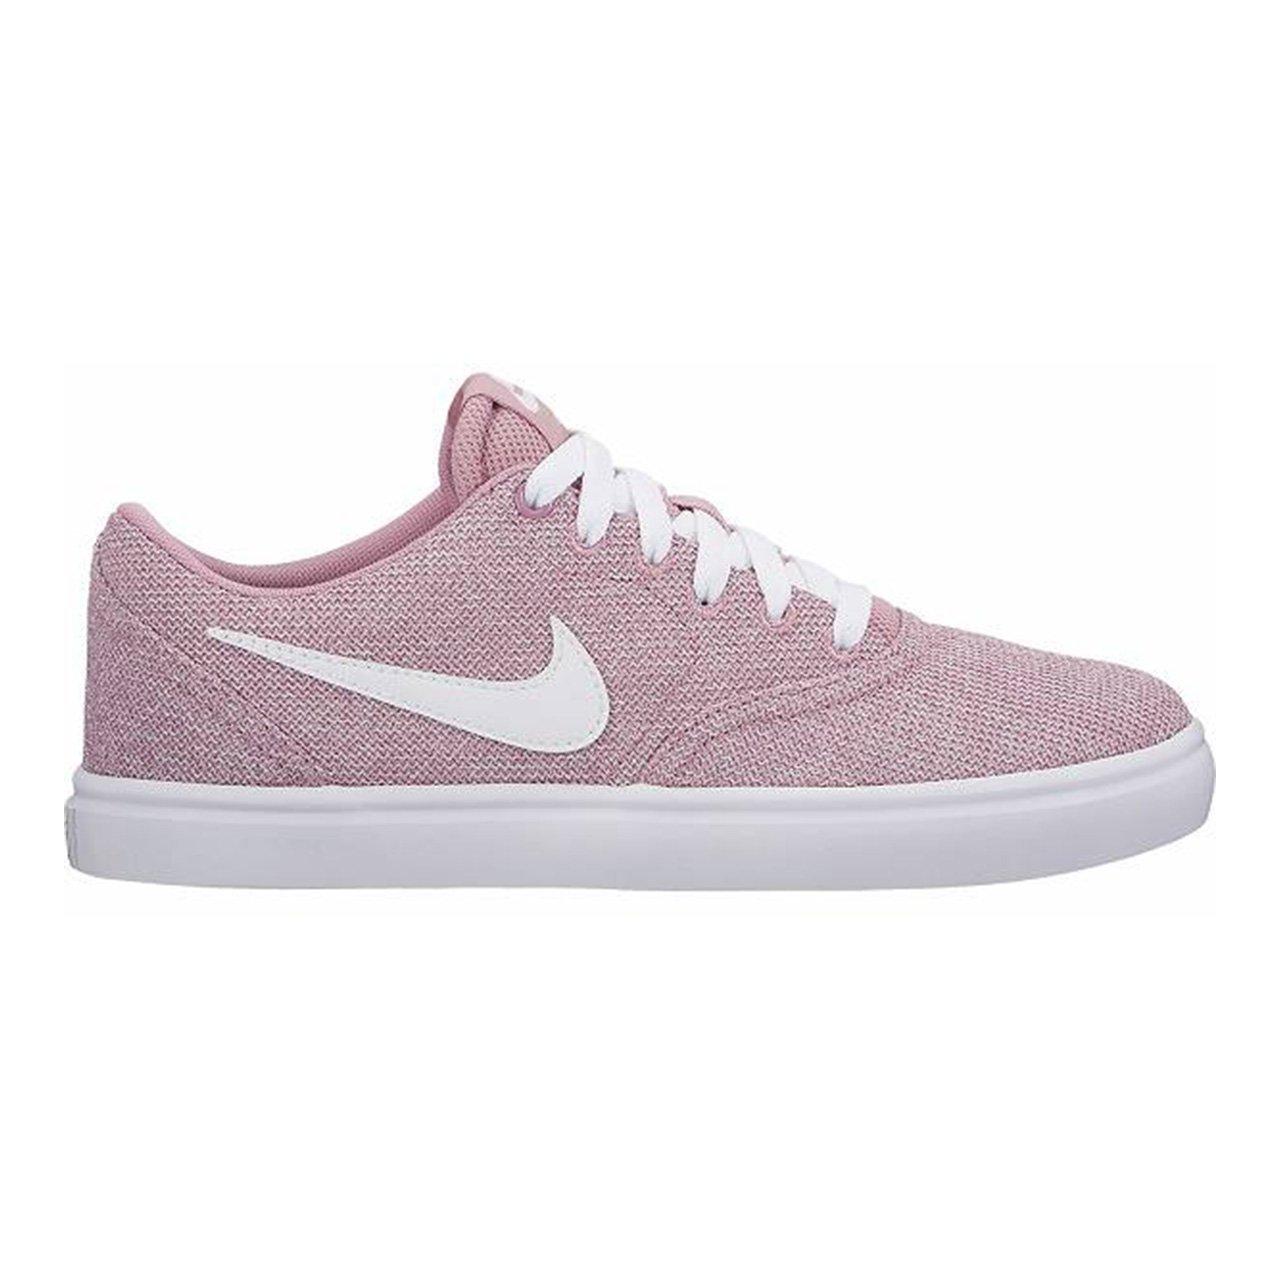 NIKE Sb Check Solar CVS P Pink/White-Black Unisex Skate Shoes Elemental Pink/White-Black P B0719116MP 9 B US|Elemental Pink/White-black cdf96d